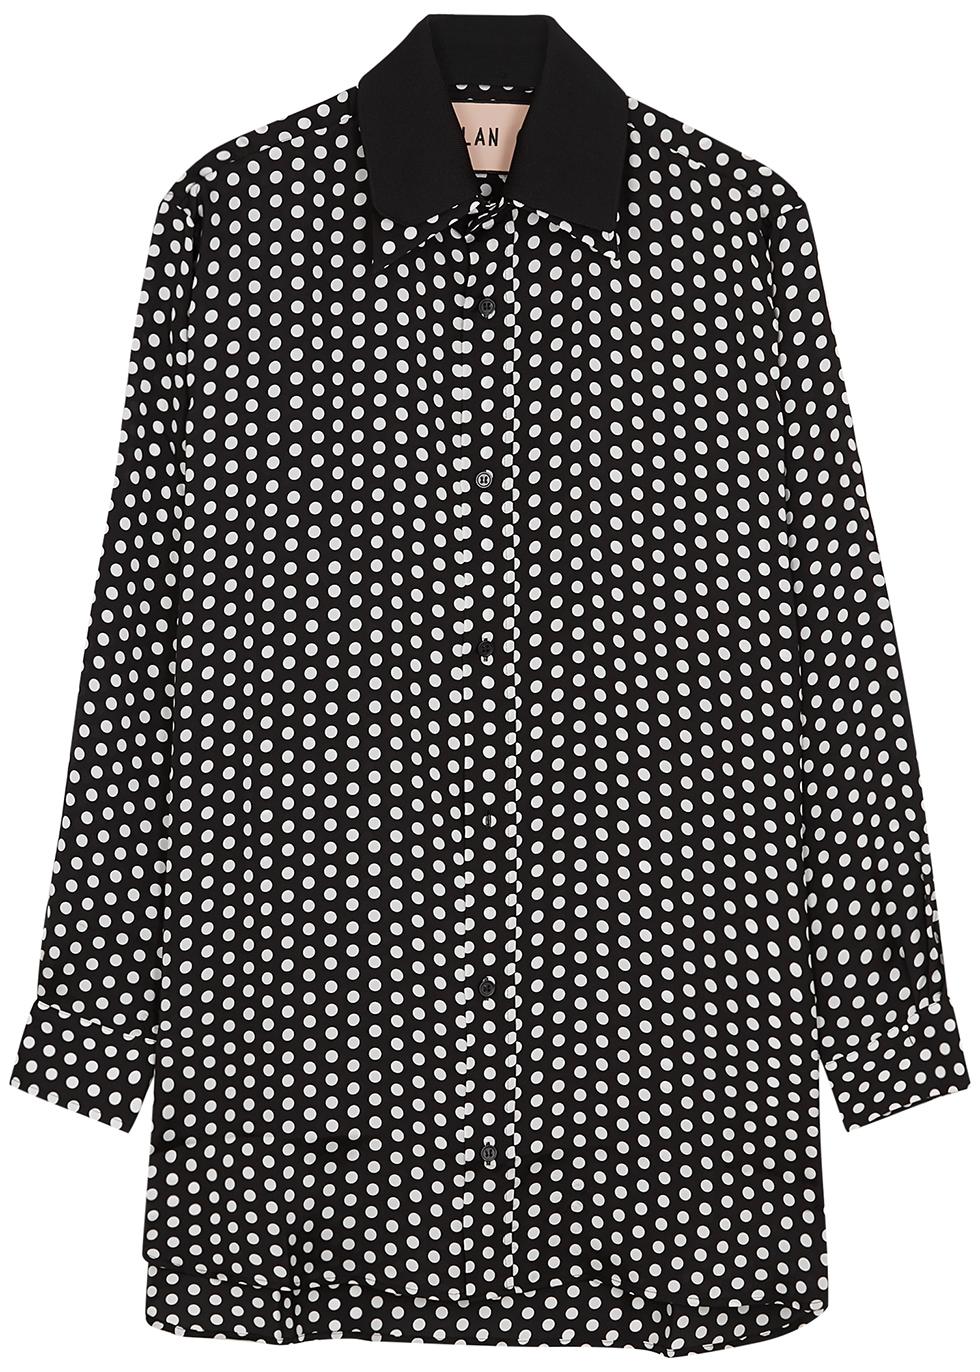 Polka-dot print shirt